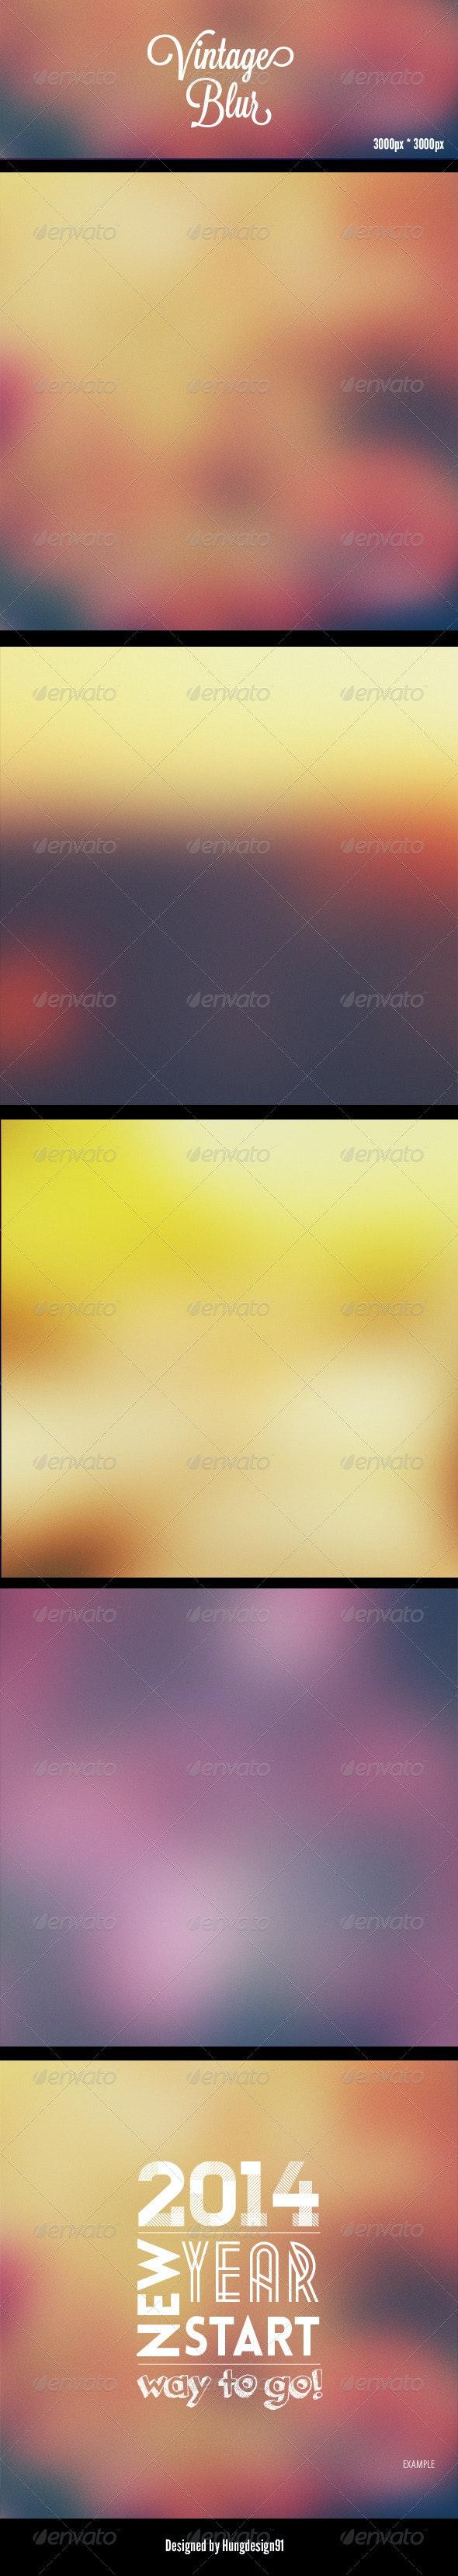 Vintage Blur Backgrounds HD - Backgrounds Graphics